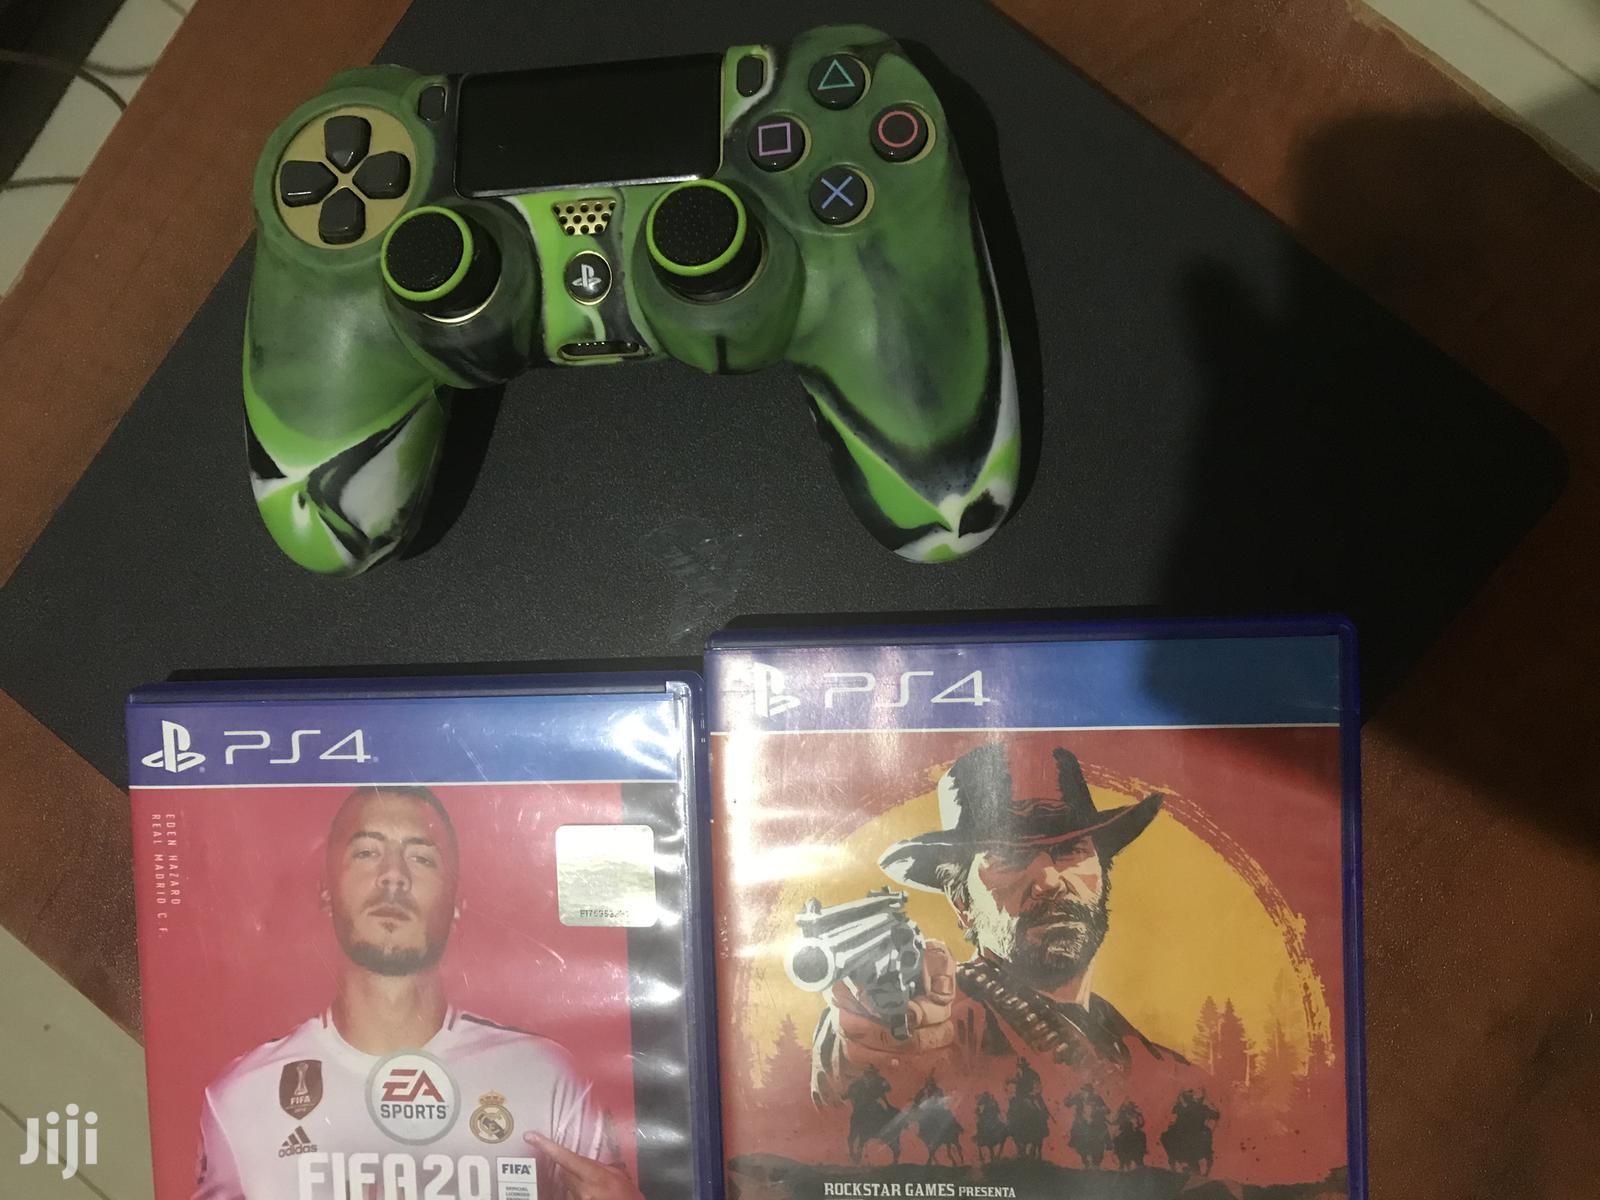 Playstation 4 Slim | Video Game Consoles for sale in Kampala, Central Region, Uganda